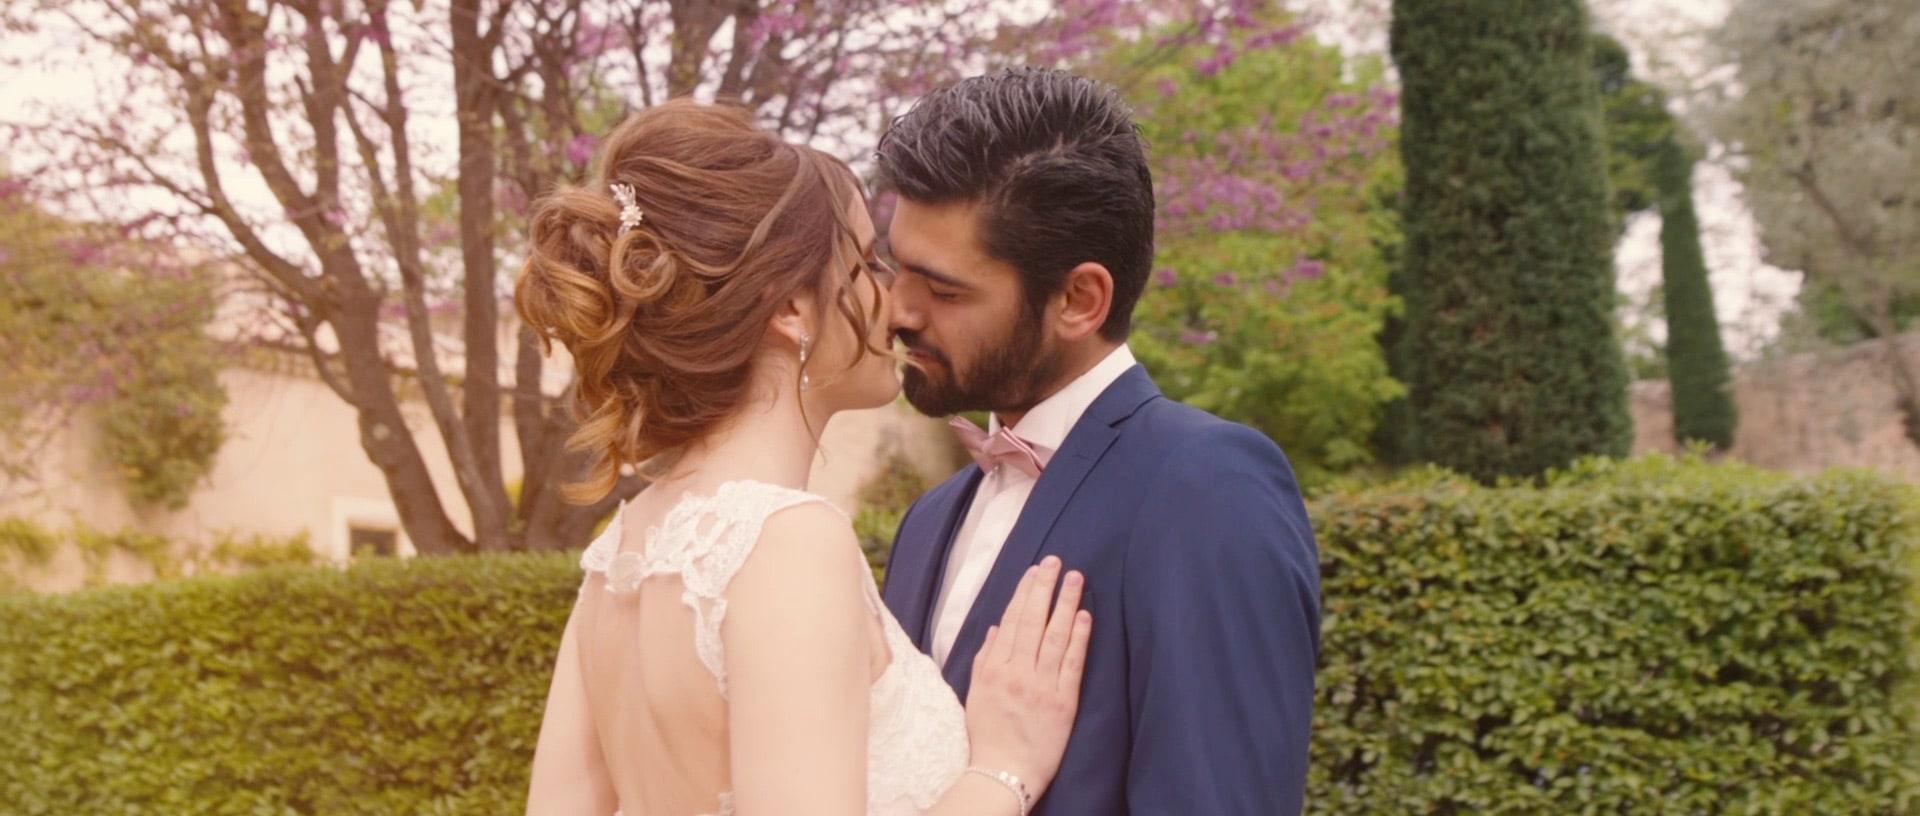 Film de Mariage au Château de Massillan